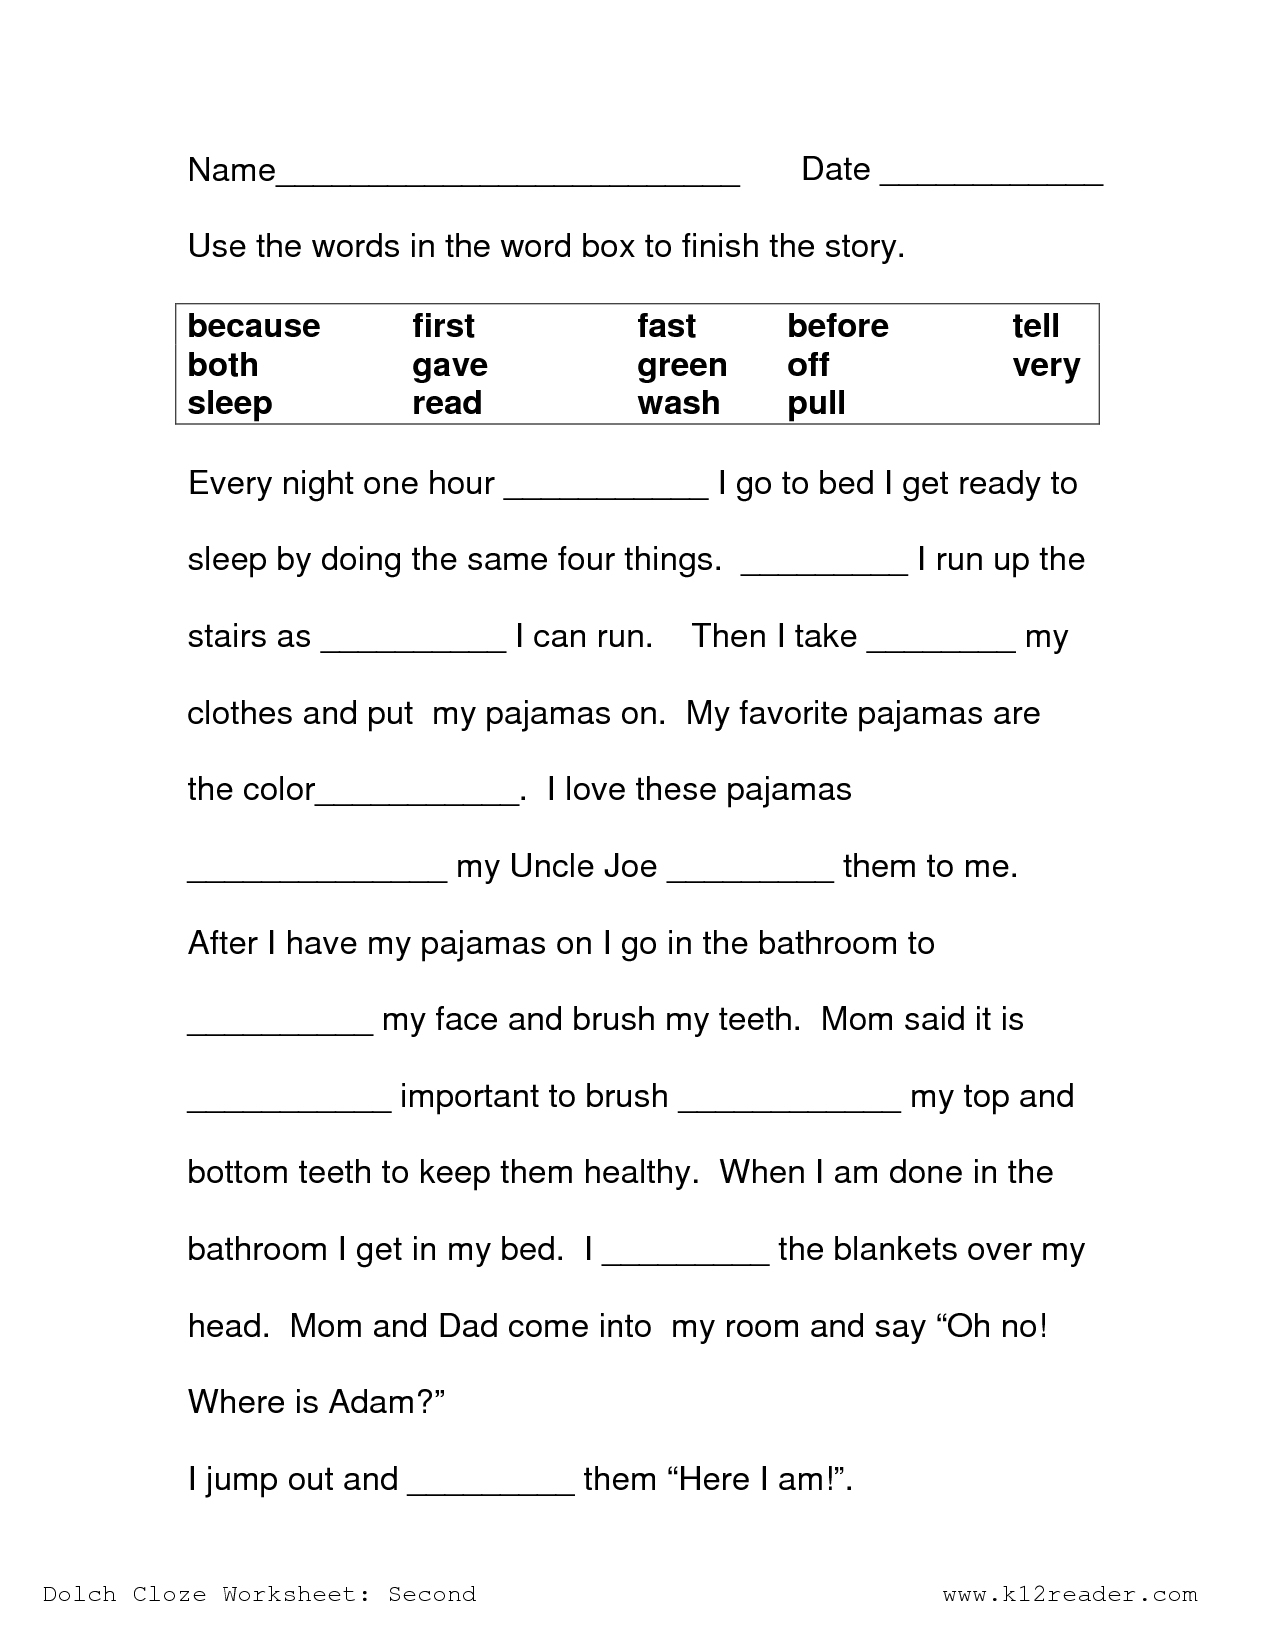 Free Printable Reading Comprehension Worksheets 3Rd Grade To Print - Free Printable Reading Comprehension Worksheets For 3Rd Grade